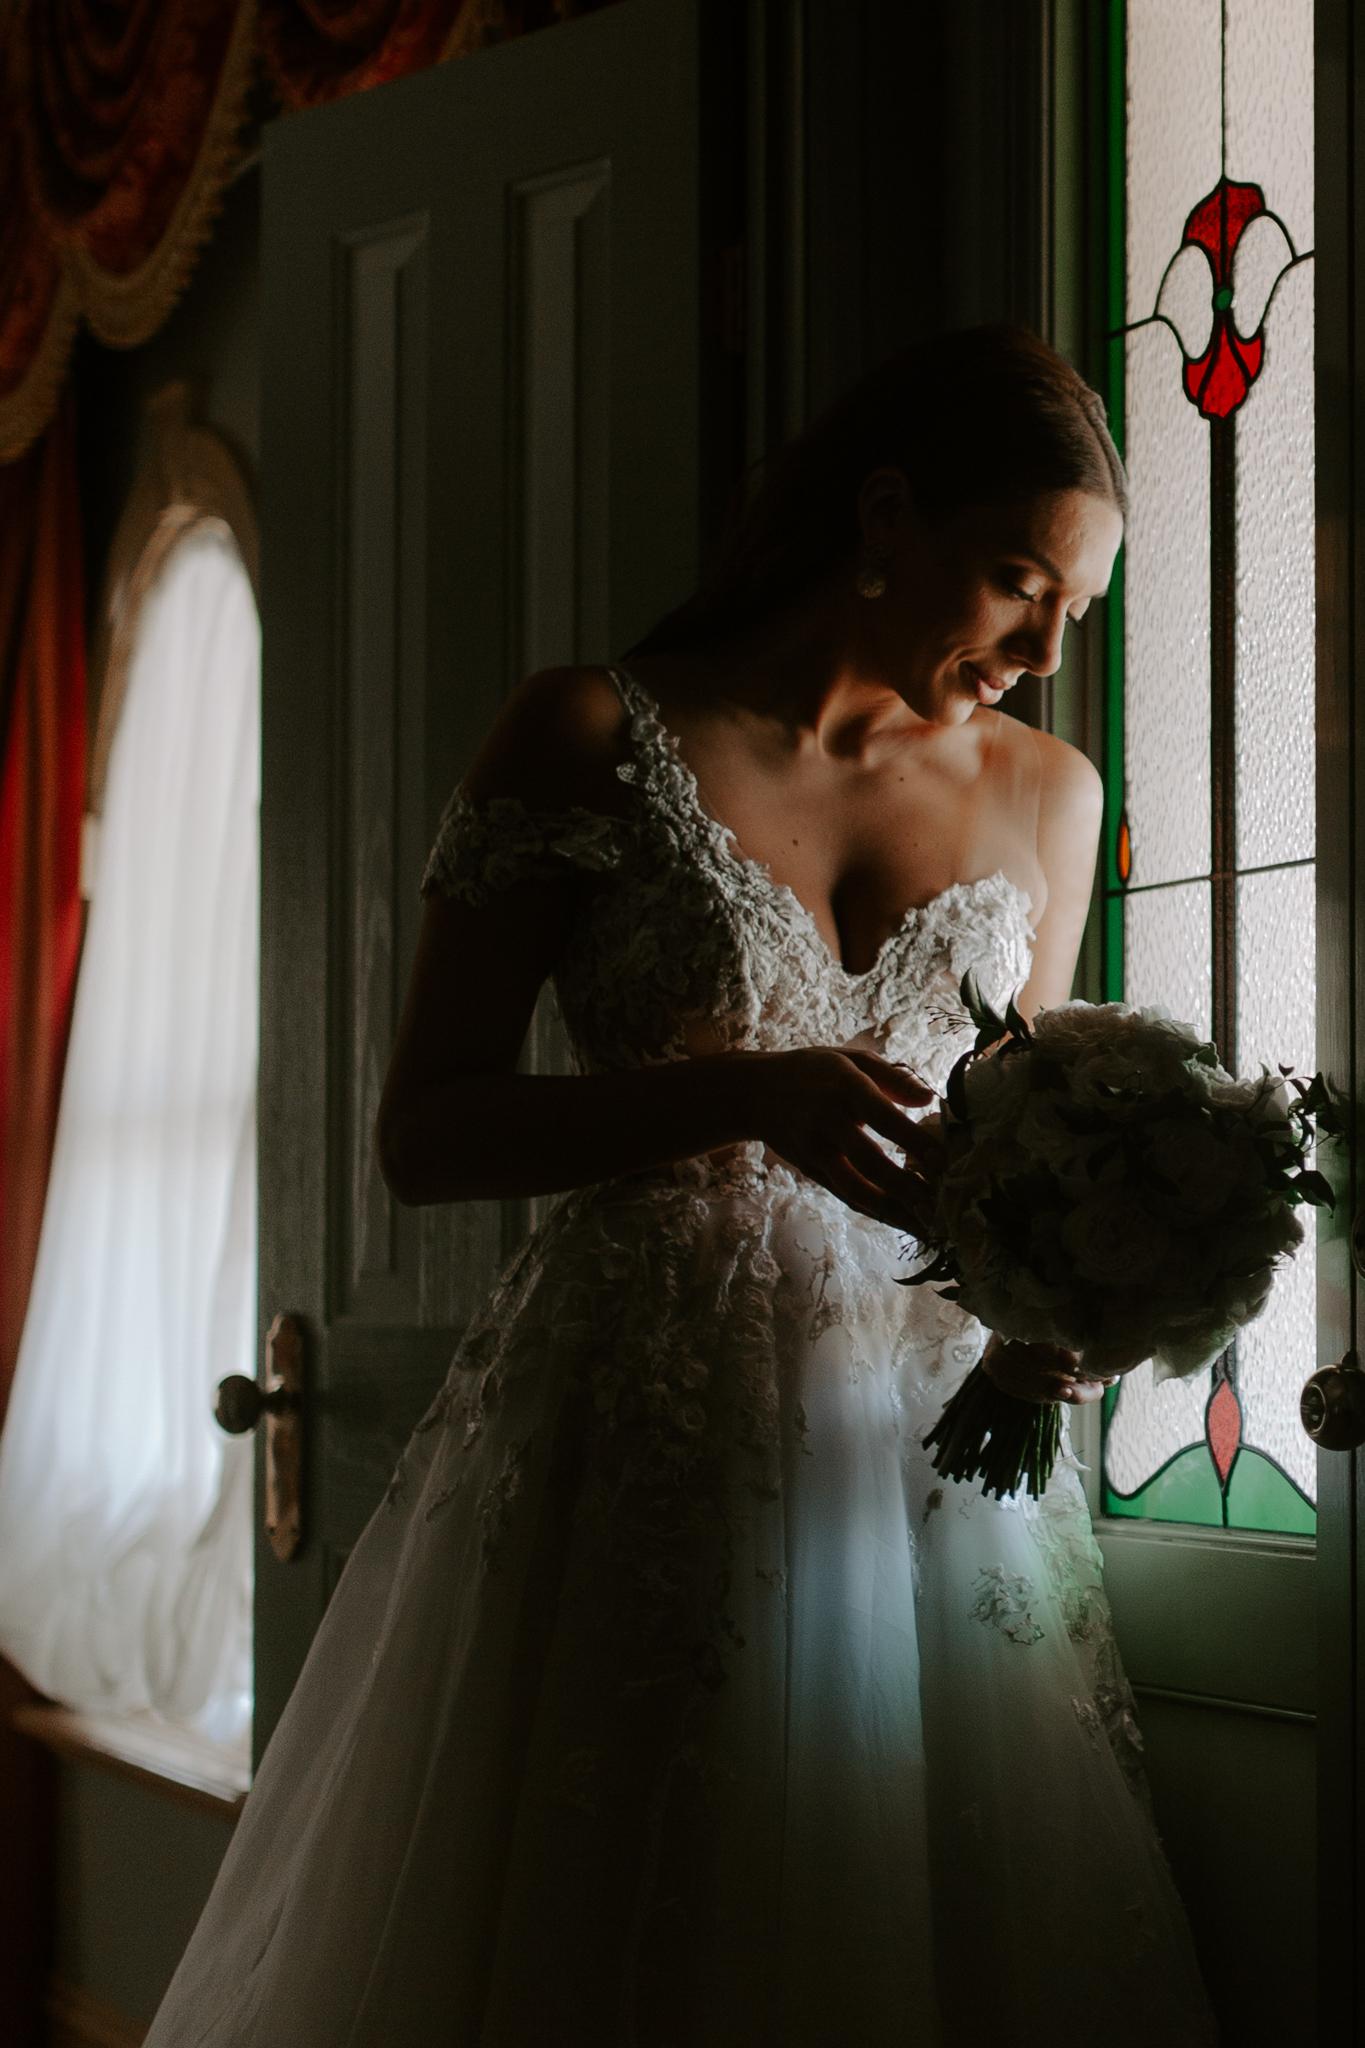 The-Stones-of-Yarra-Valley-Wedding-EmotionsandMathPhotography-019.jpg